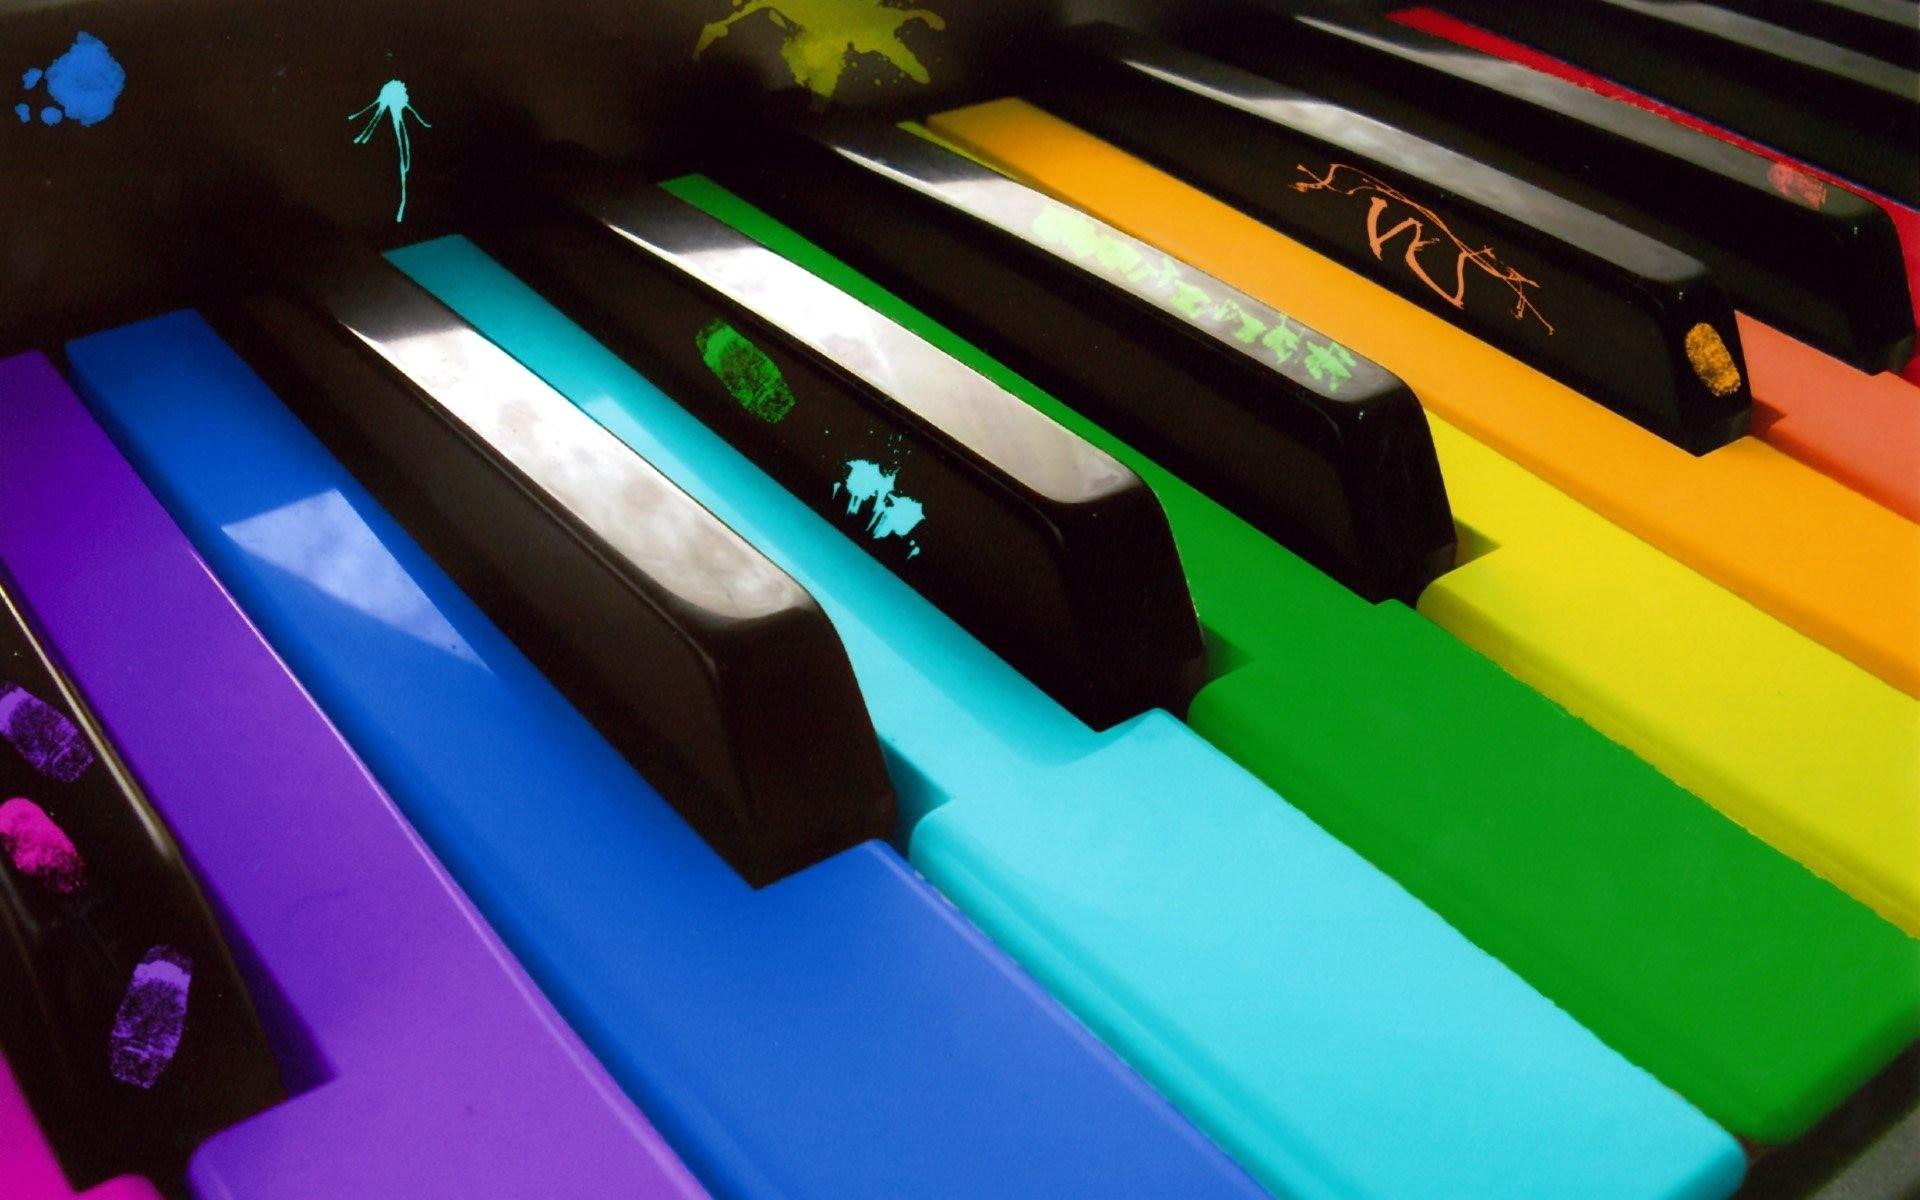 colorful-piano-keyboard-music-hd-wallpaper-1920×1200-3837 - Music Keyboard PNG HD